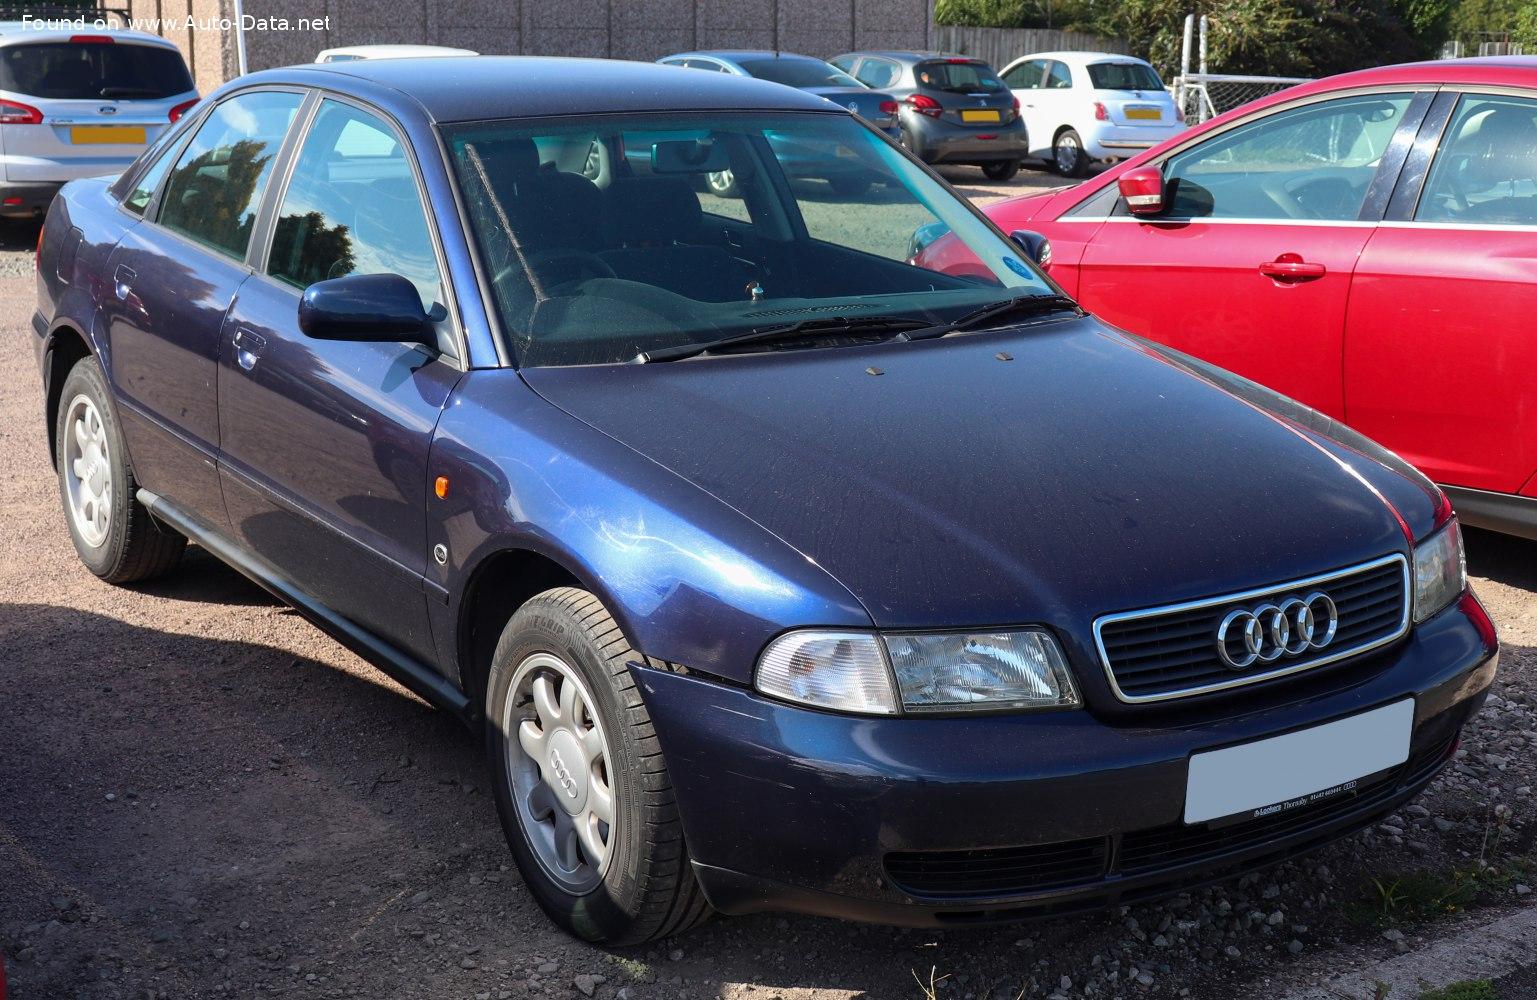 Kekurangan Audi A4 1.8 Tangguh